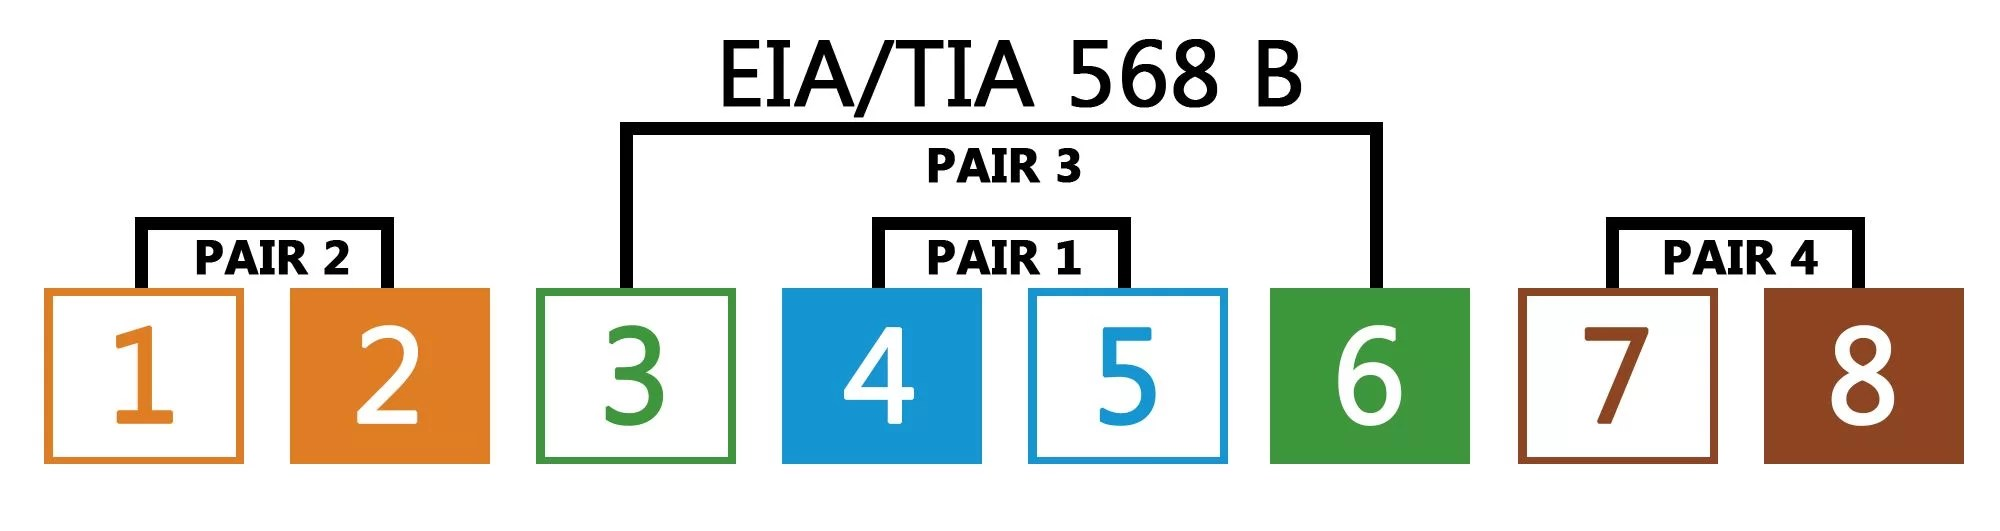 rj45_belegung_EIA_TIA_568B_pair?resize\\\\\\\=665%2C177 wiring diagram for door entry system concer biz on wiring diagram lr 63663 wiring diagram at eliteediting.co